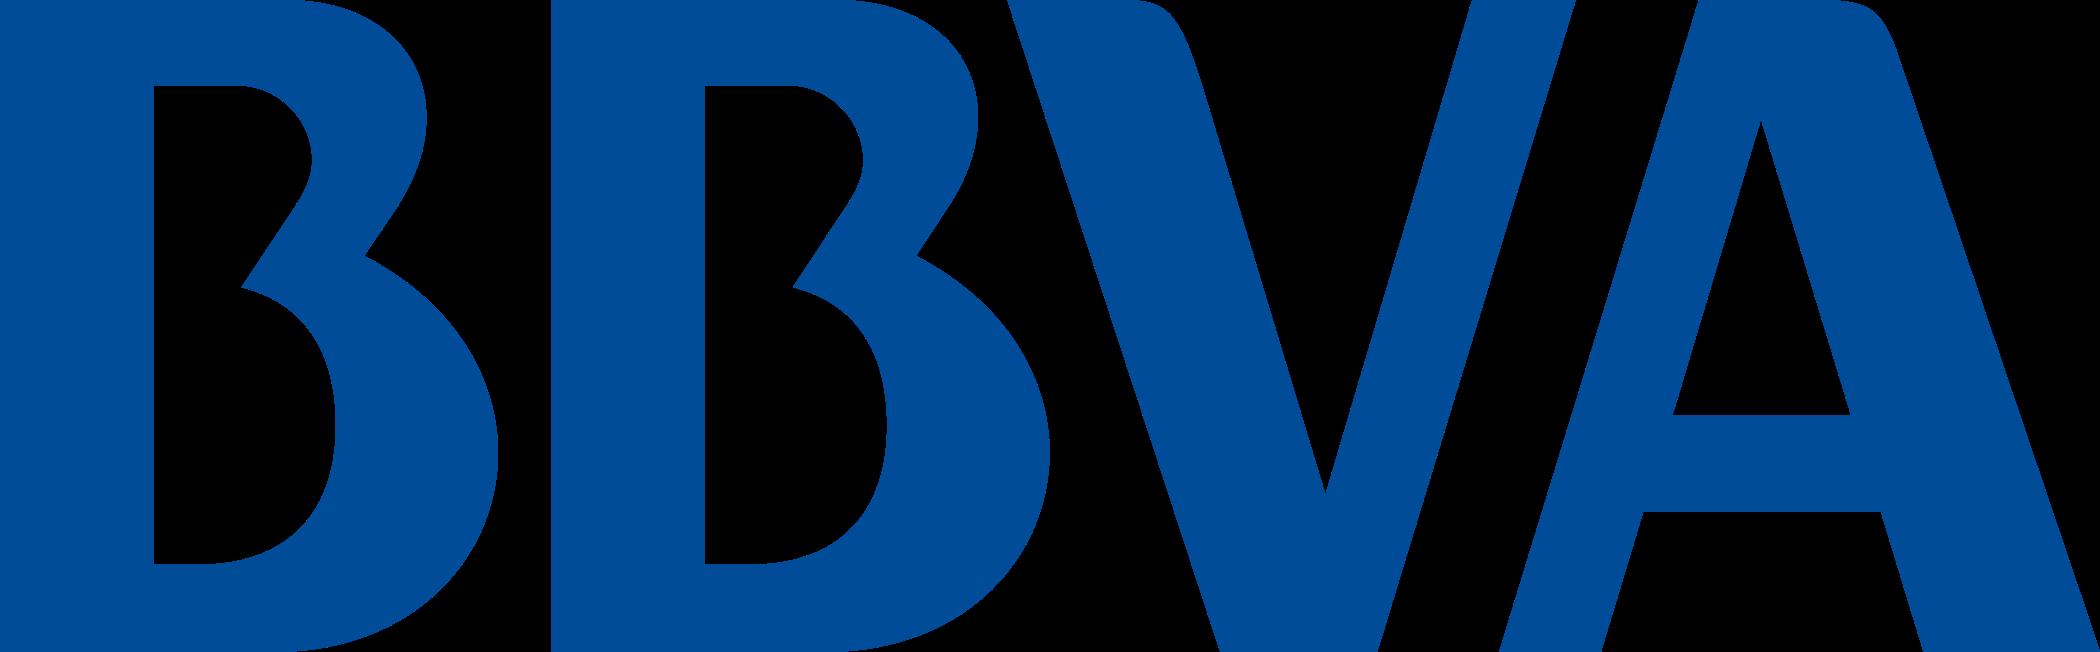 bbva-logo-2